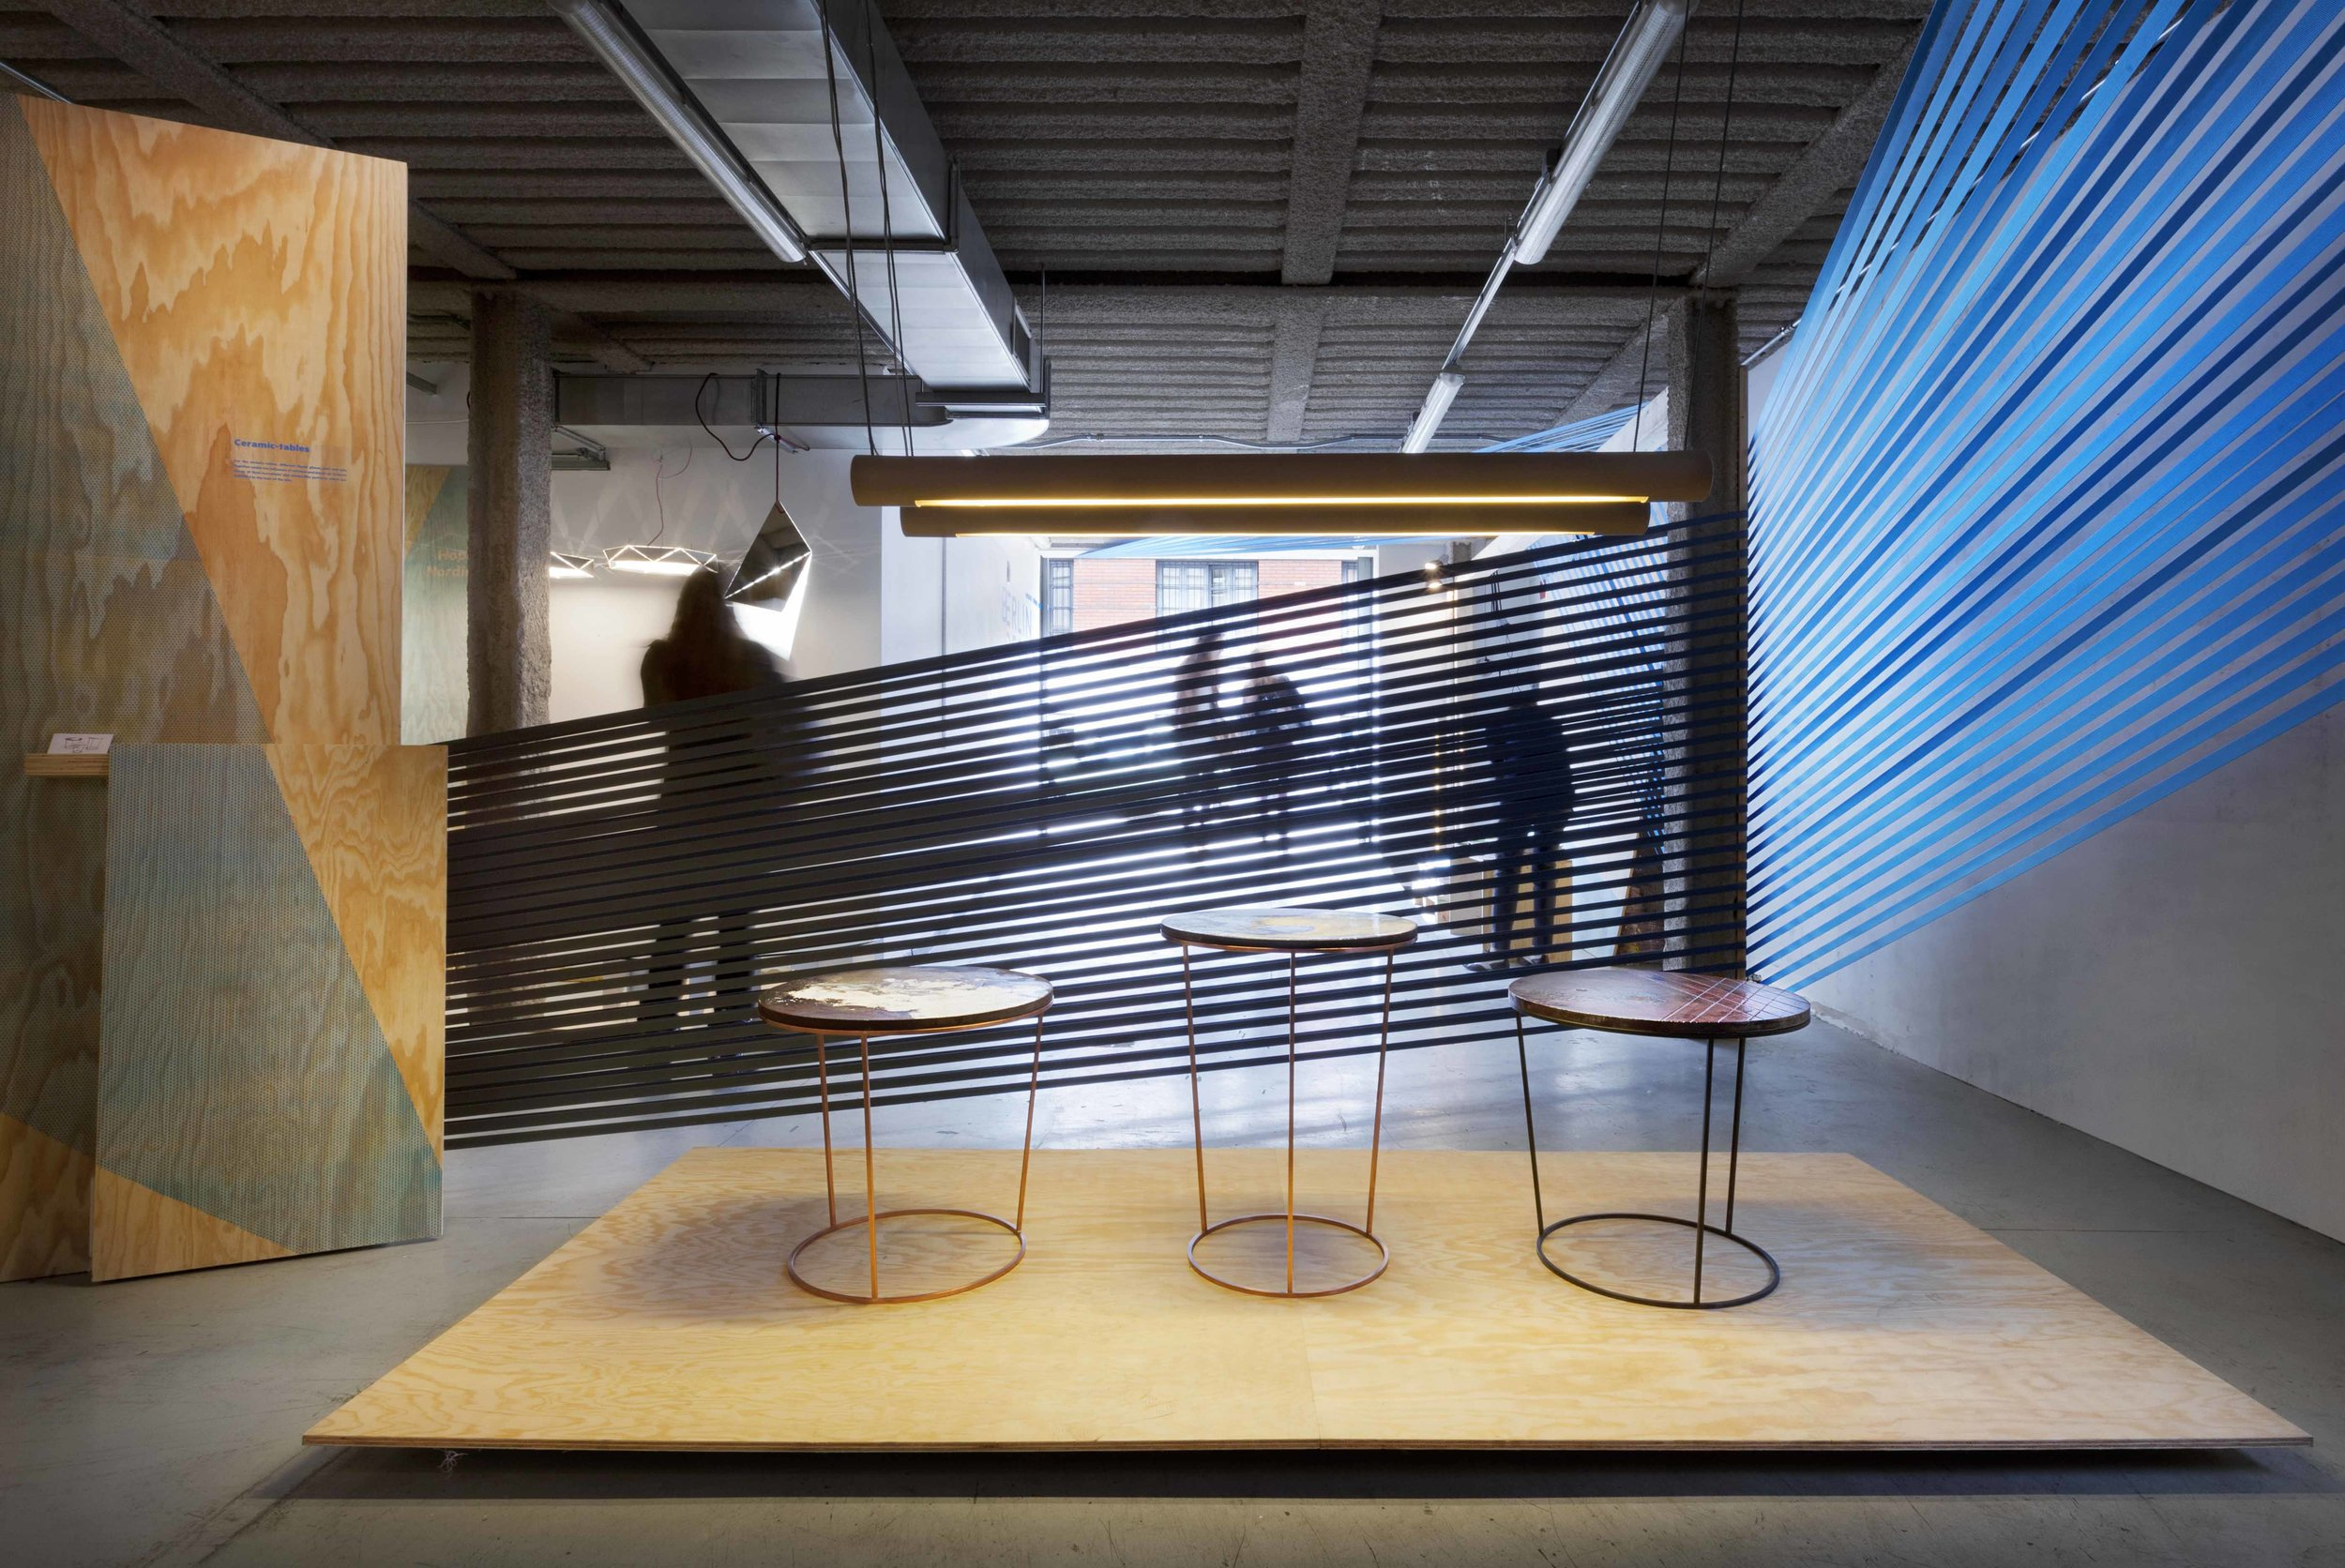 berlin-design-selection-milan_tradefair-exhibition-design_coordination-berlin__06.jpg